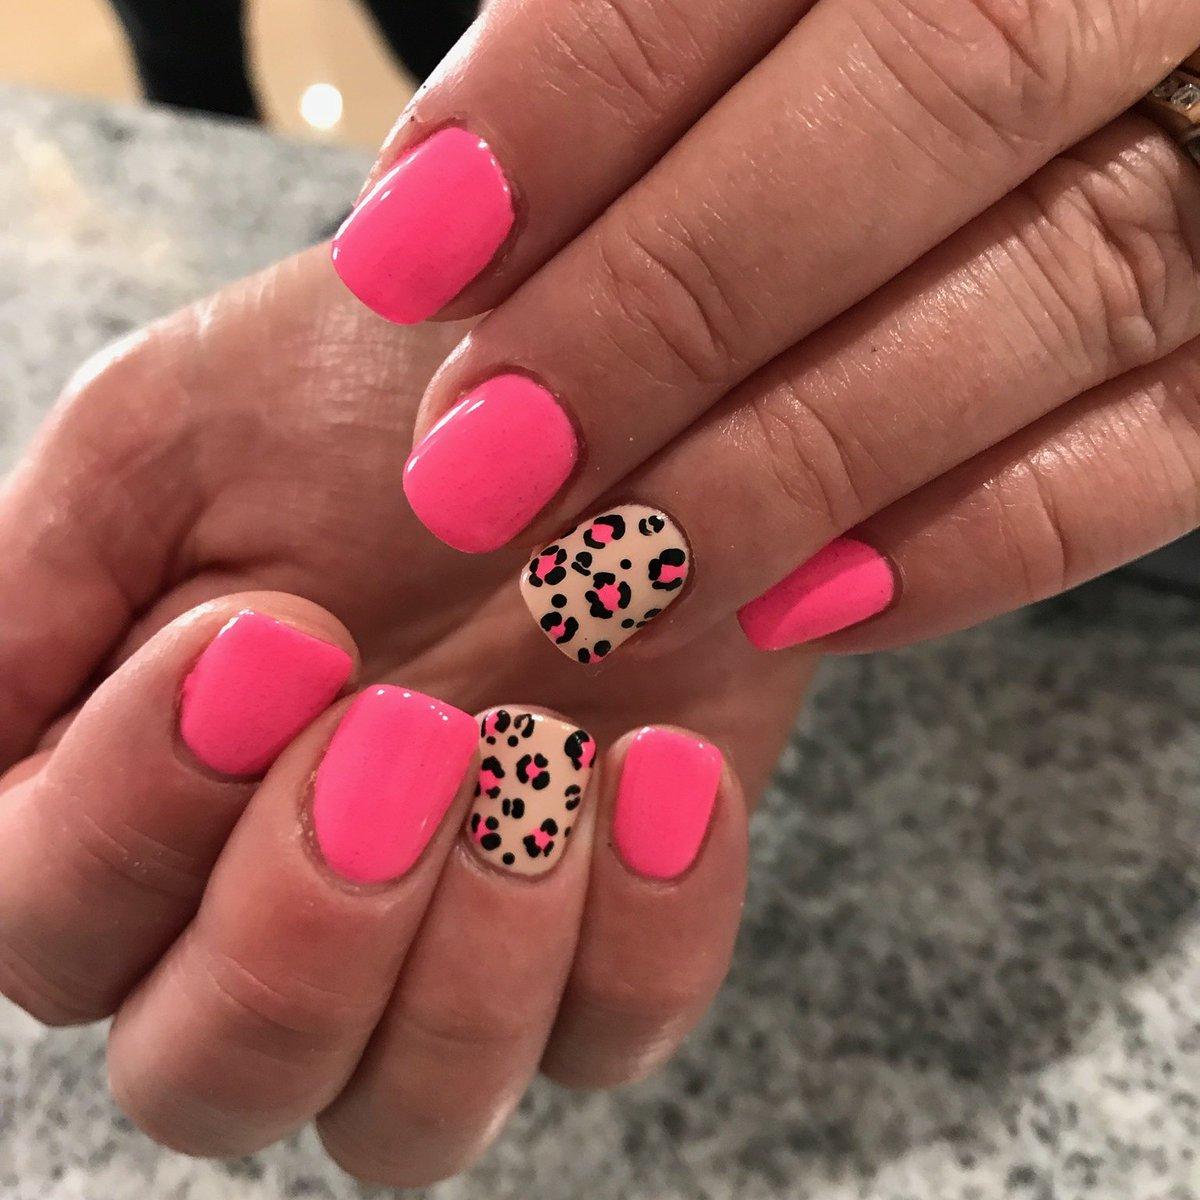 Kim Stinebaugh On Twitter Bubble Gum Pink And Cheetah Print Nails